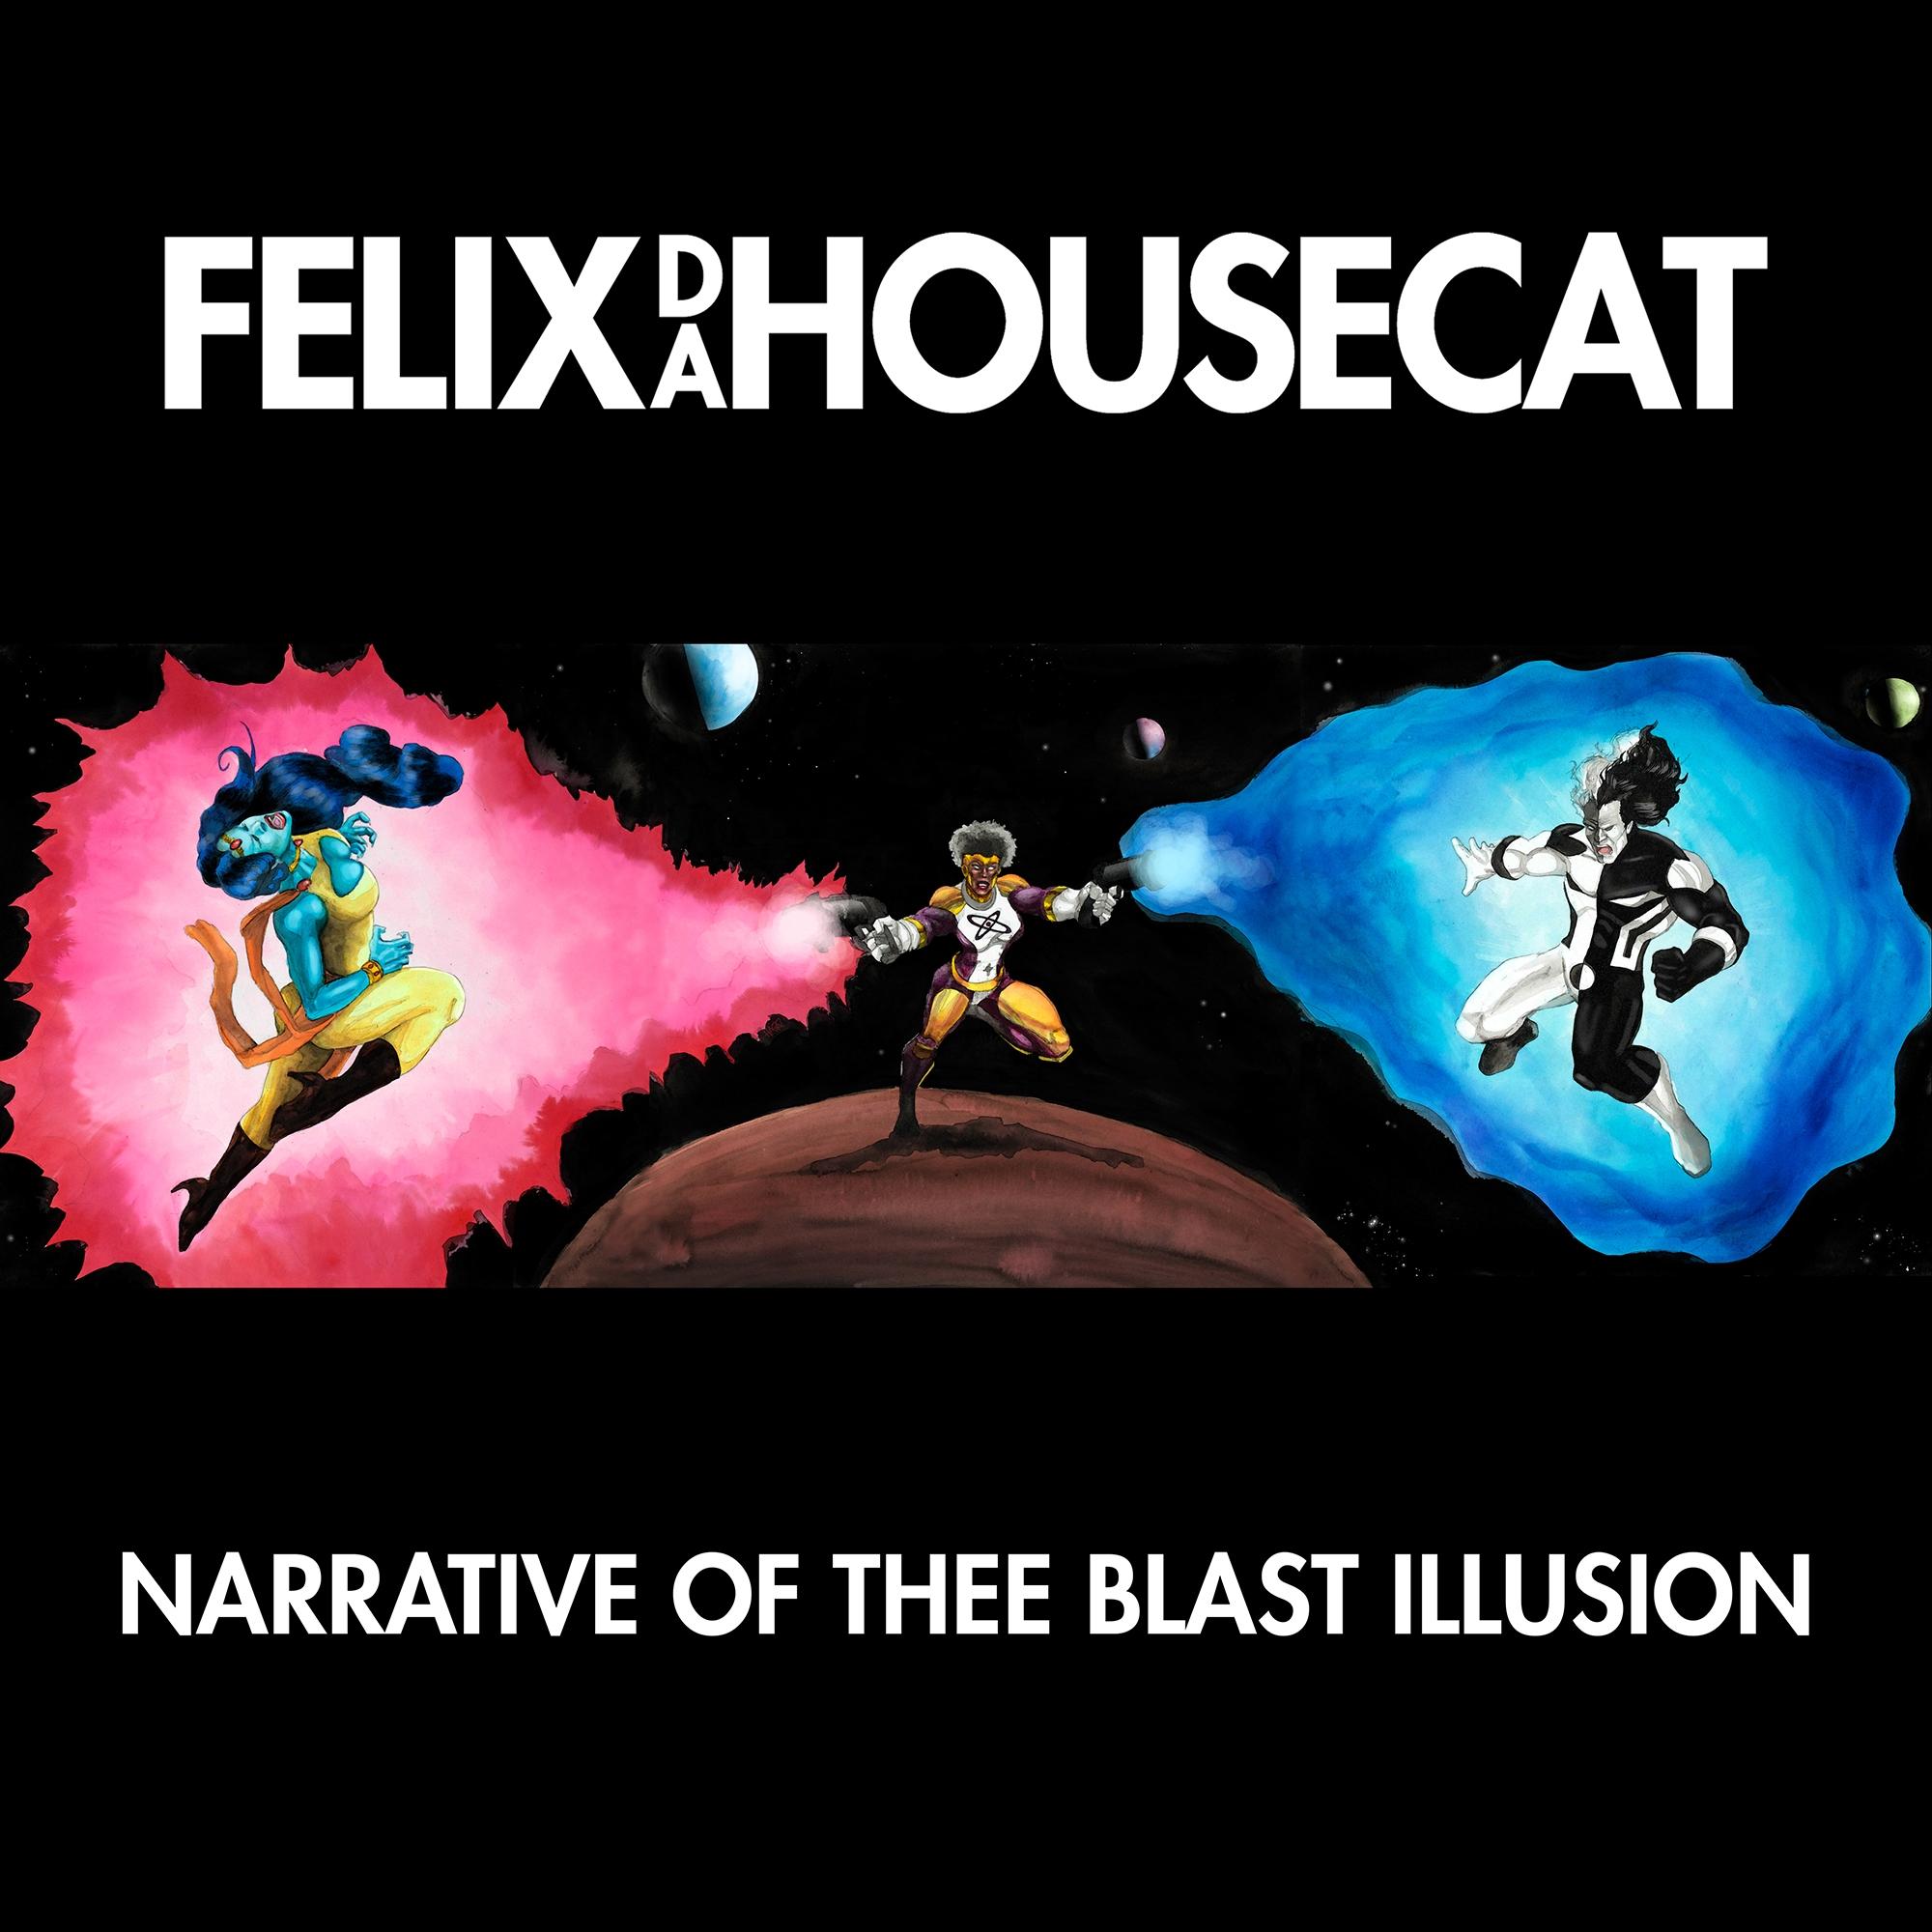 felix-narrative-of-thee-blast-illusion